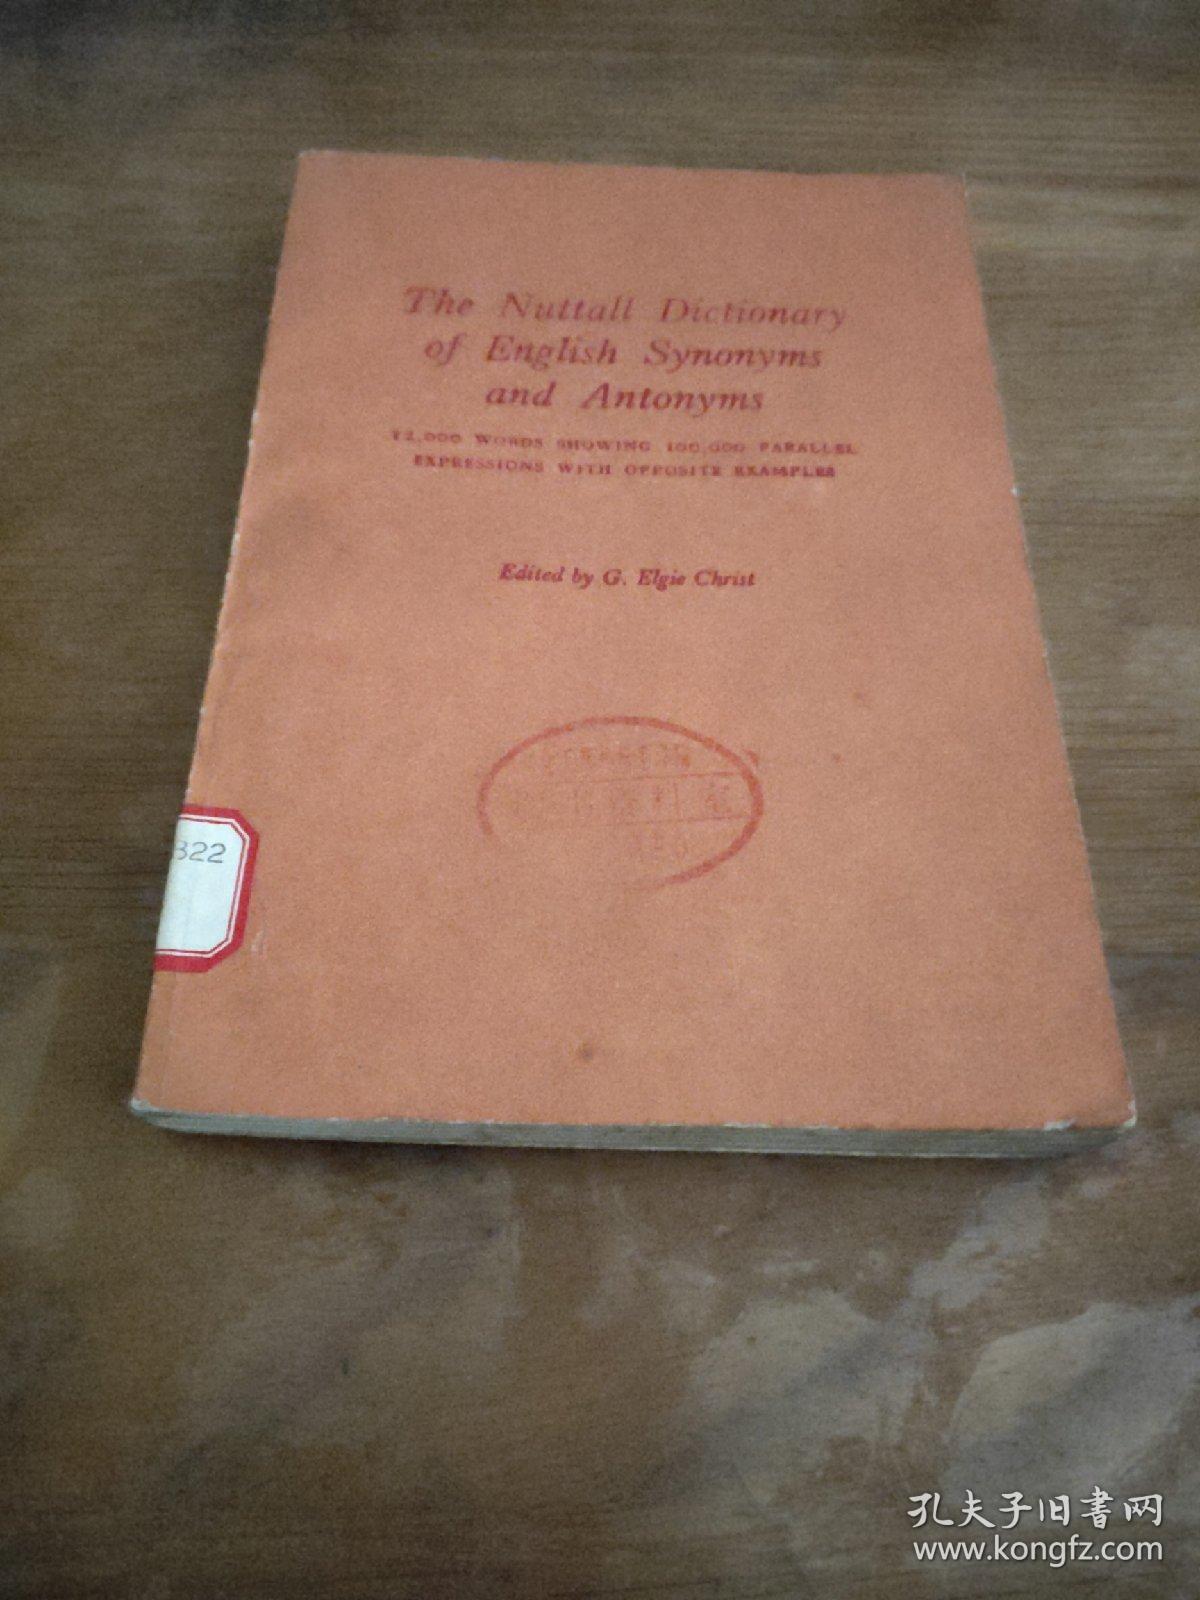 THE NUTTALL DICTIONARY OF ENGLISH SYNONYMA AND ANTONYMS(纳托英语同义词与反义词词典)【英文版,国内影印】